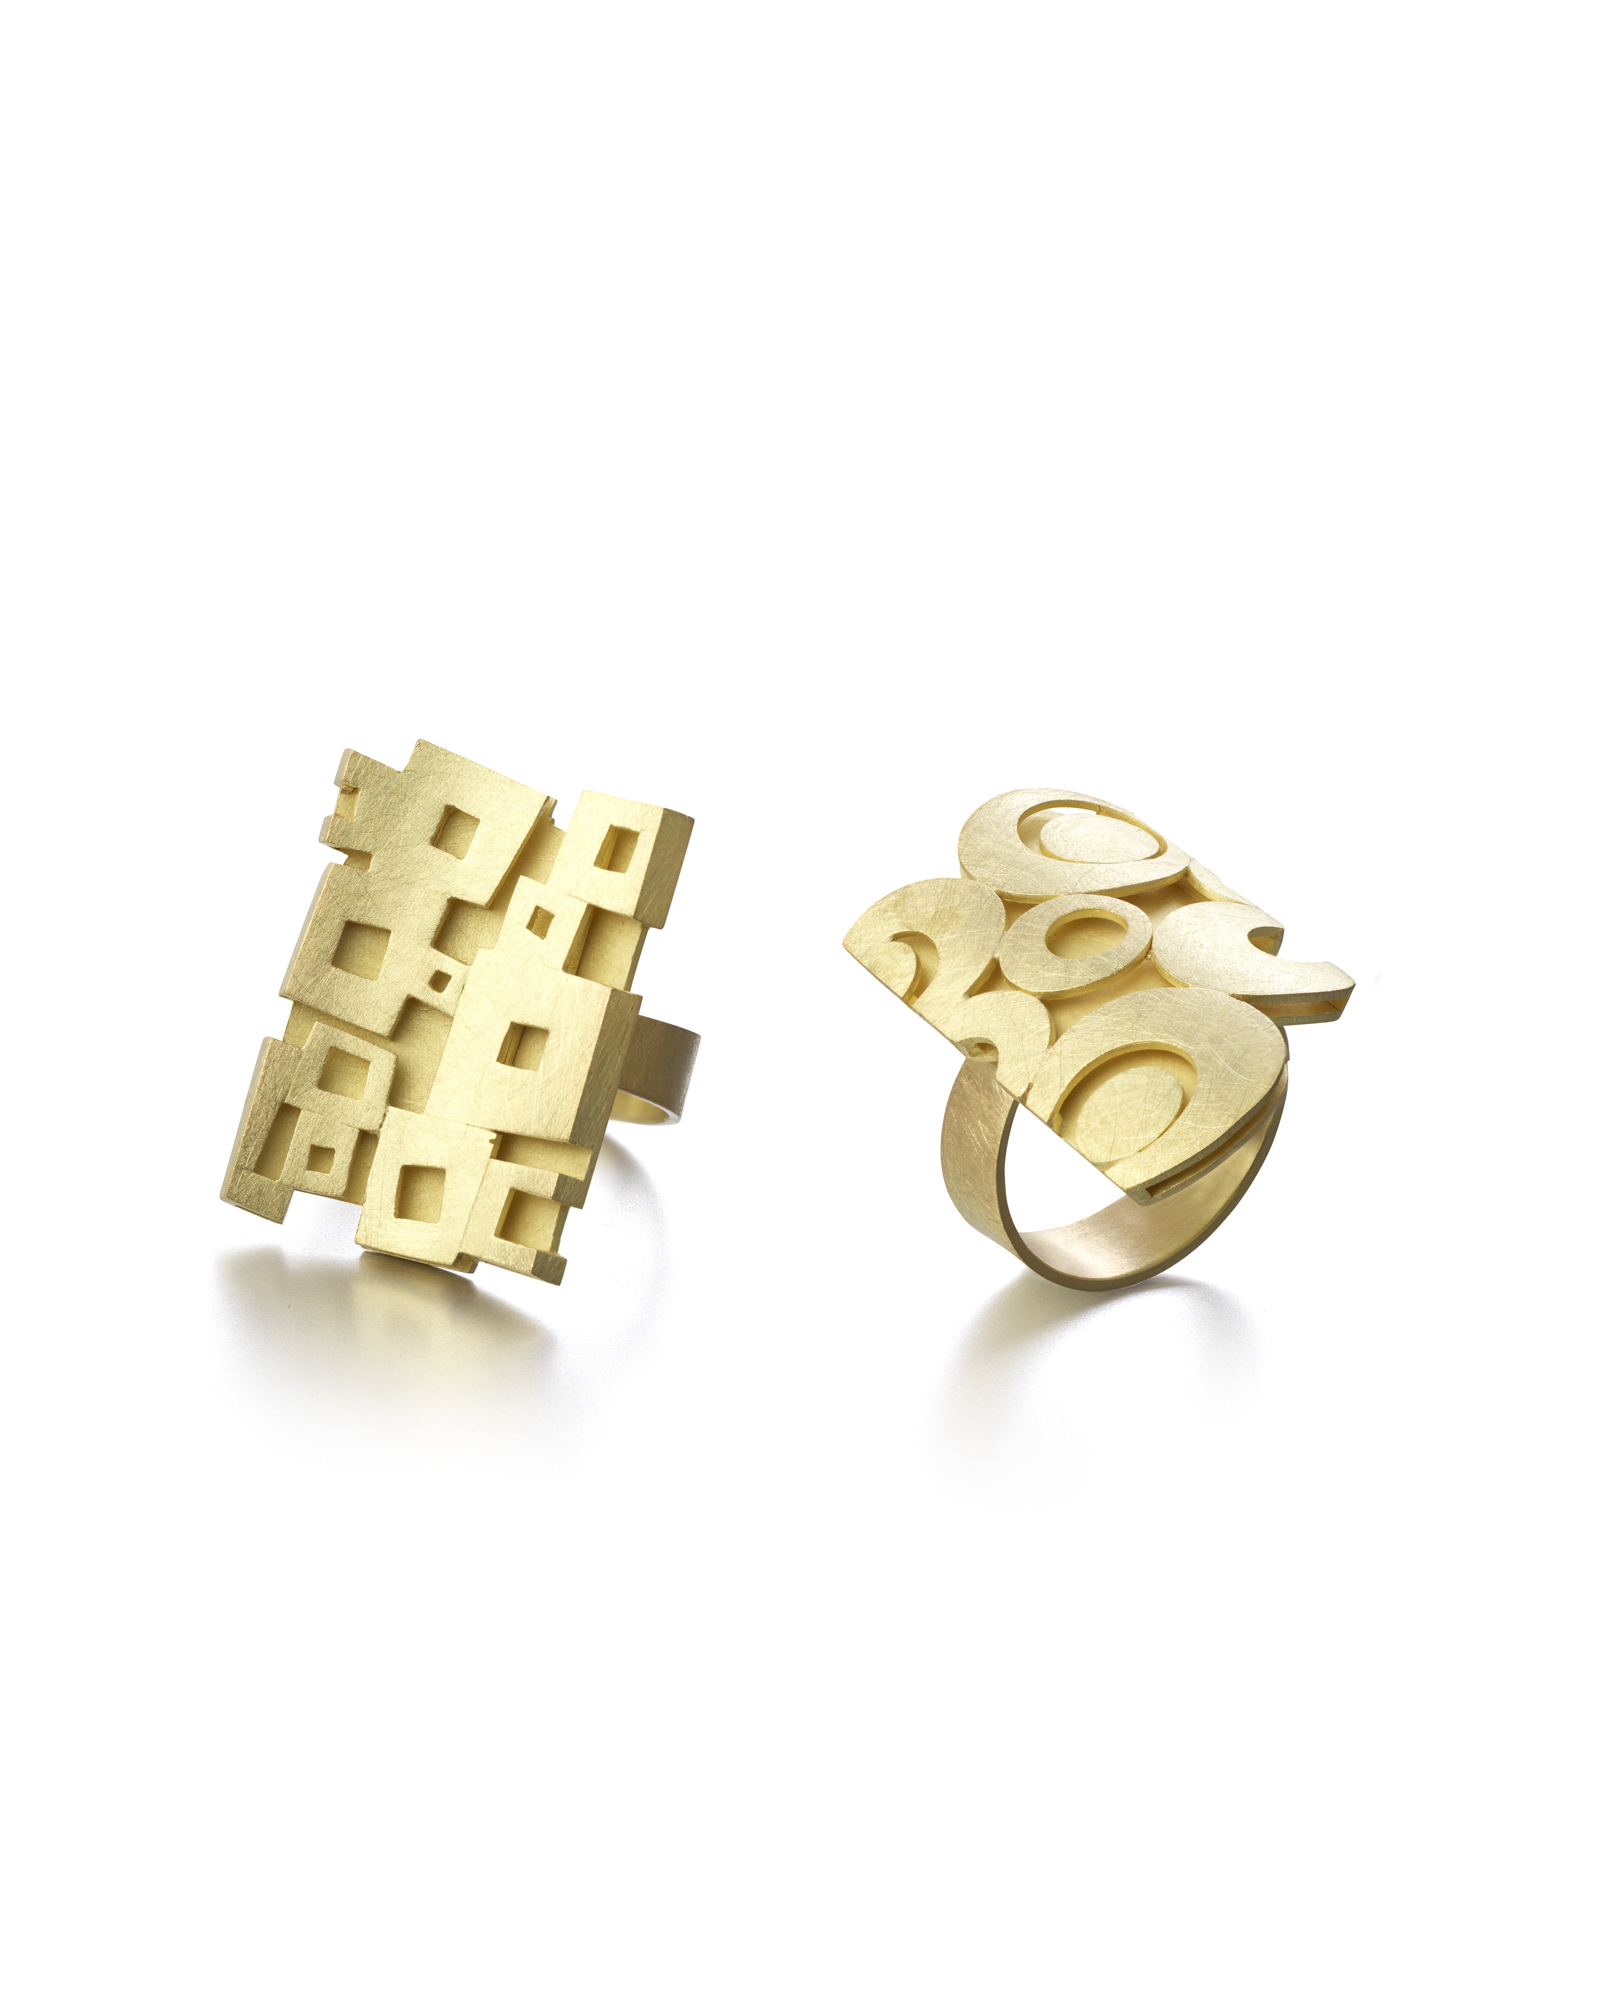 Louise O'Neill-two 18ct 'retro' rings.jpg